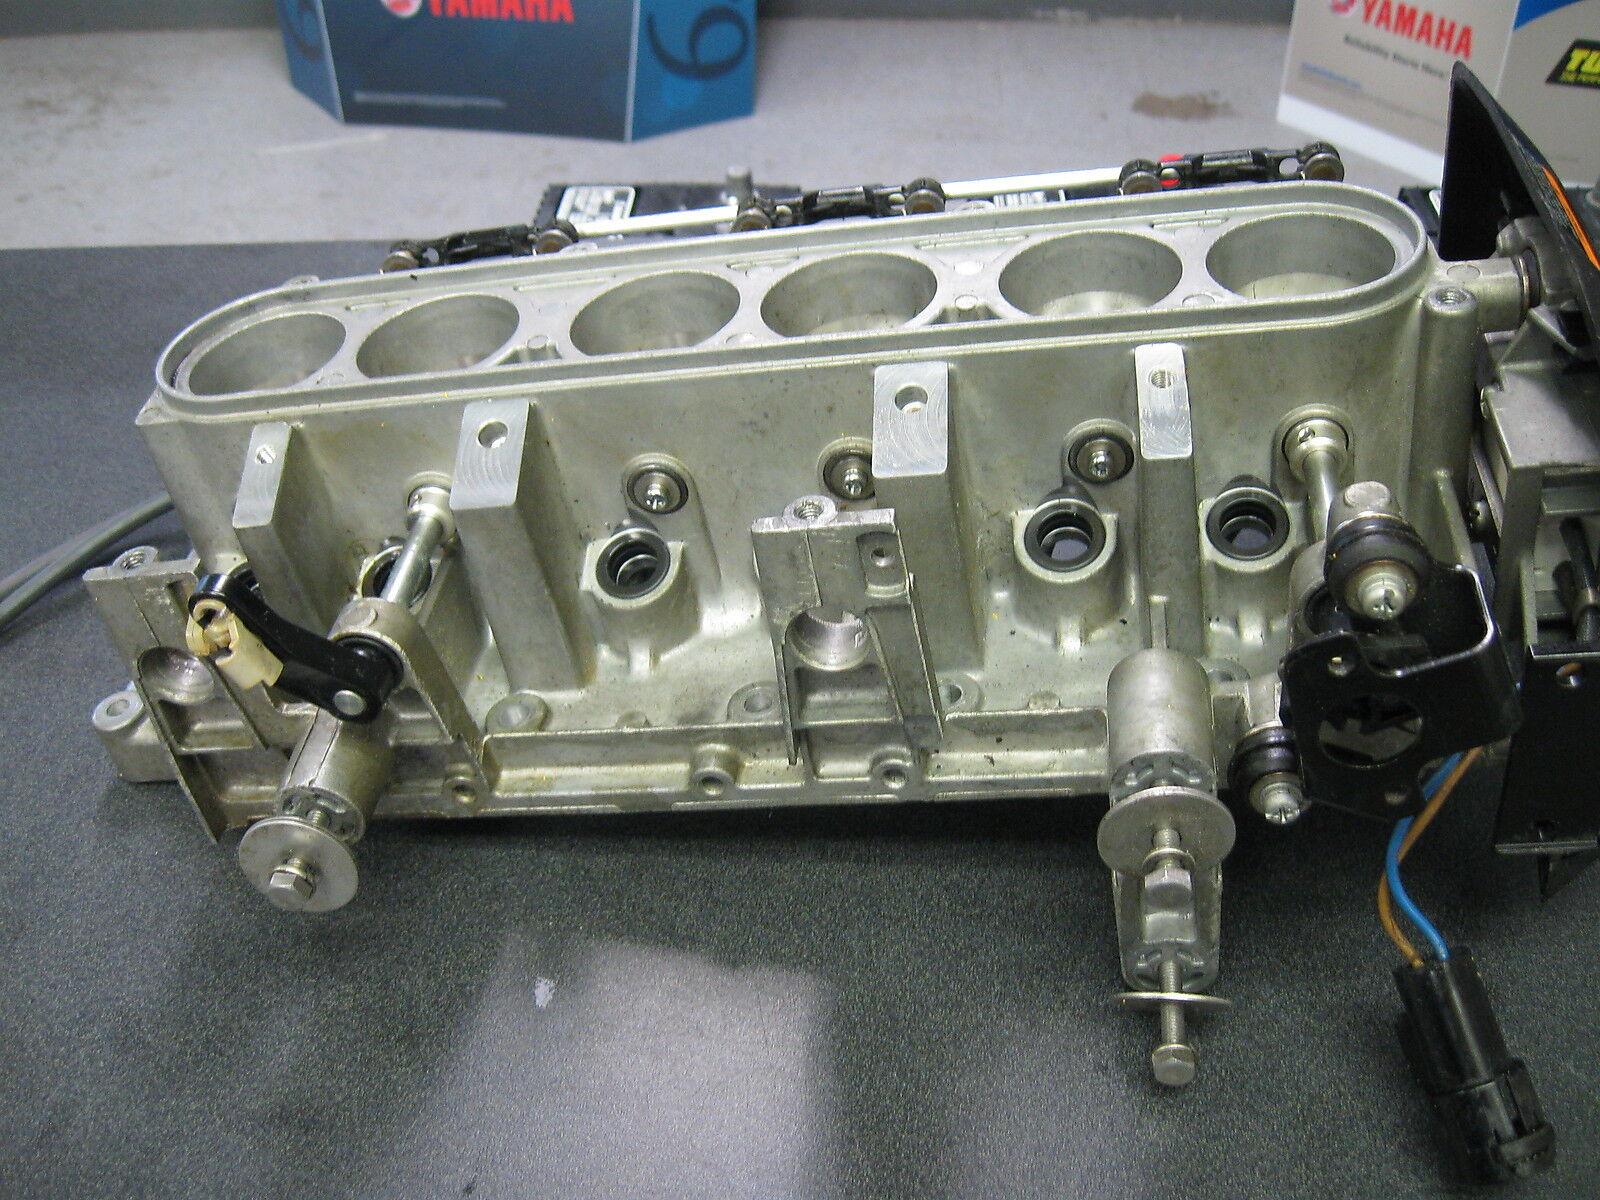 Yamaha 66K-13751-00-00 Außenborder Drosselklappengehäuse 1 Teilenummer 66K-13751-00-00 Yamaha eb3502